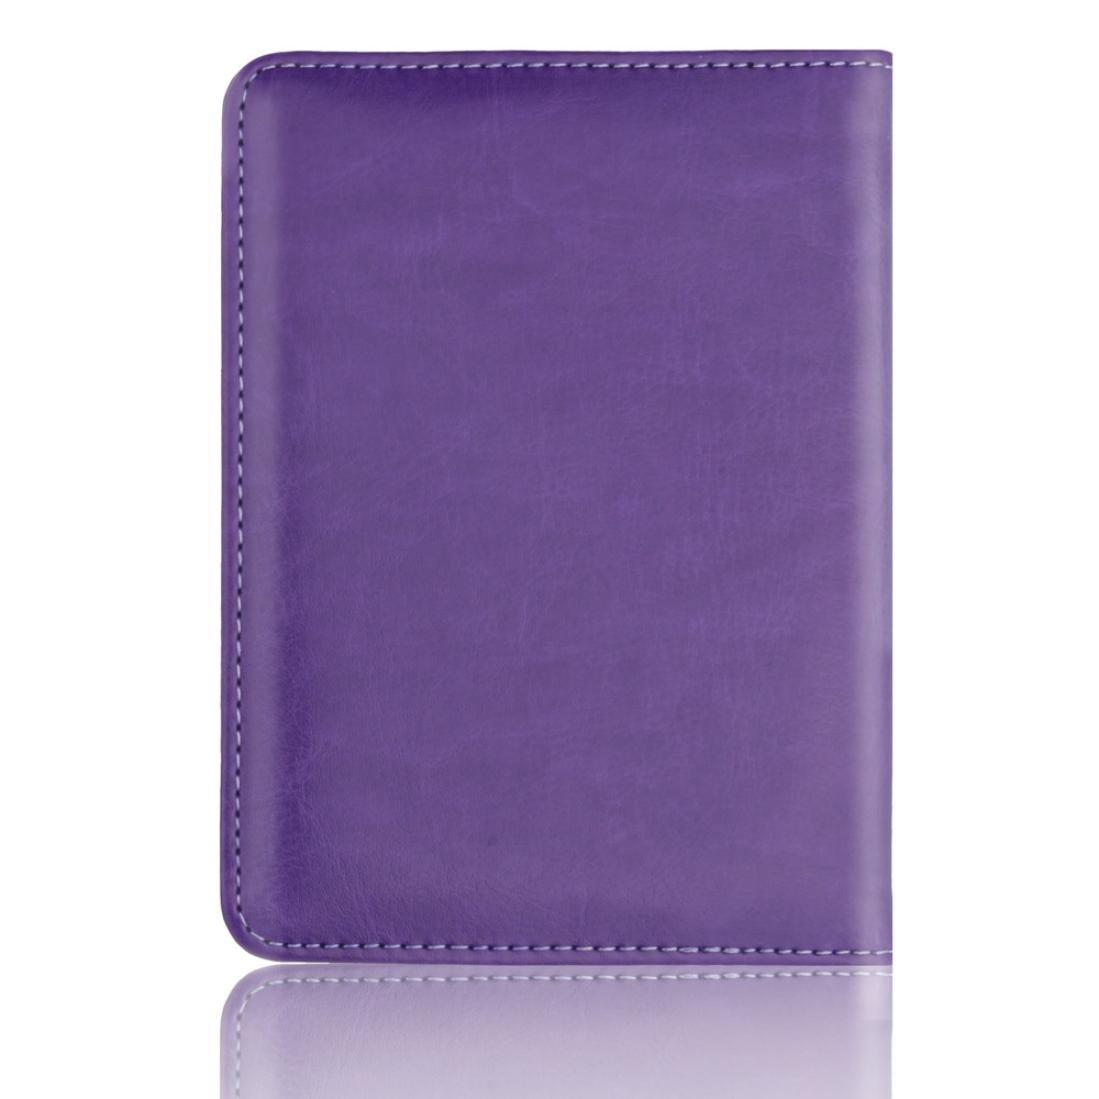 Blue Storage Package Yezijin Leather Passport Holder Wallet Cover Case RFID Blocking Travel Wallet